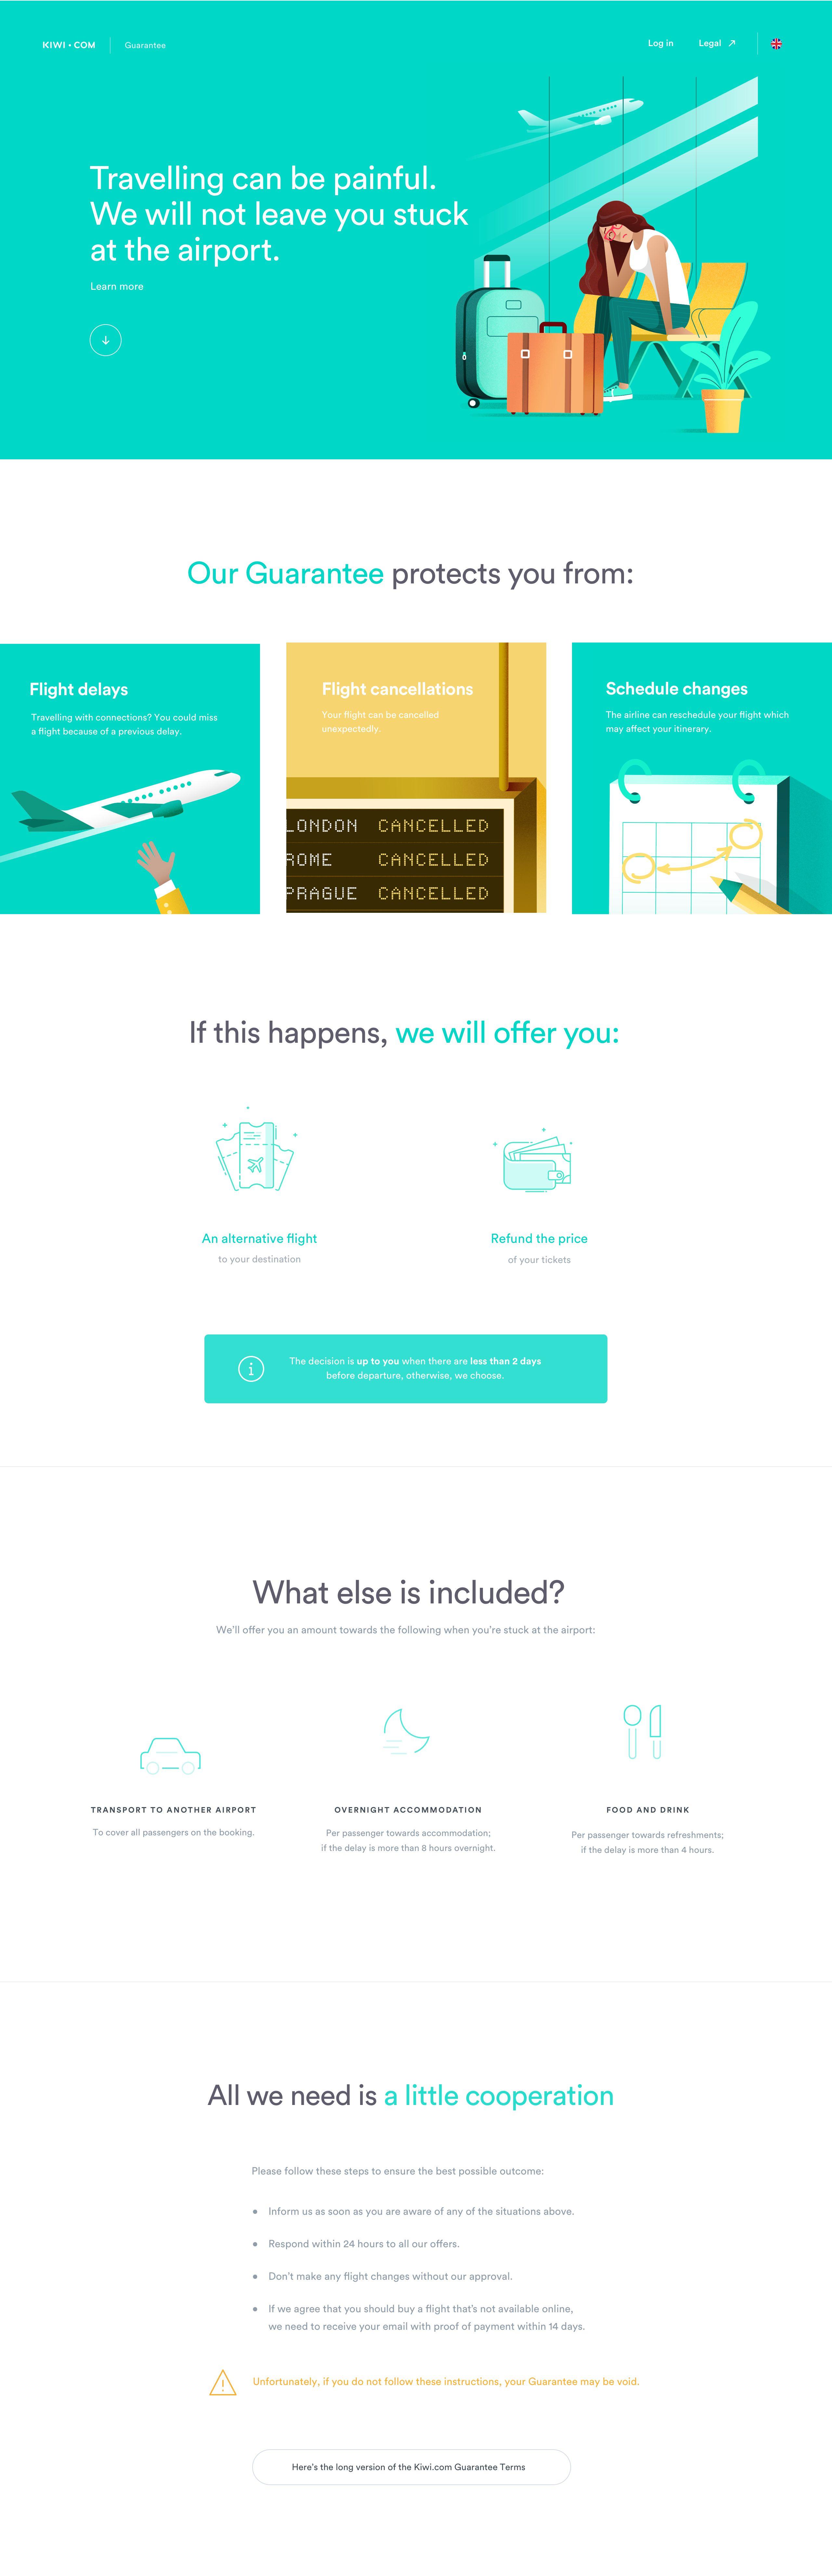 Guarantee All Green 2x Beautiful Web Design Web Design Website Design Inspiration